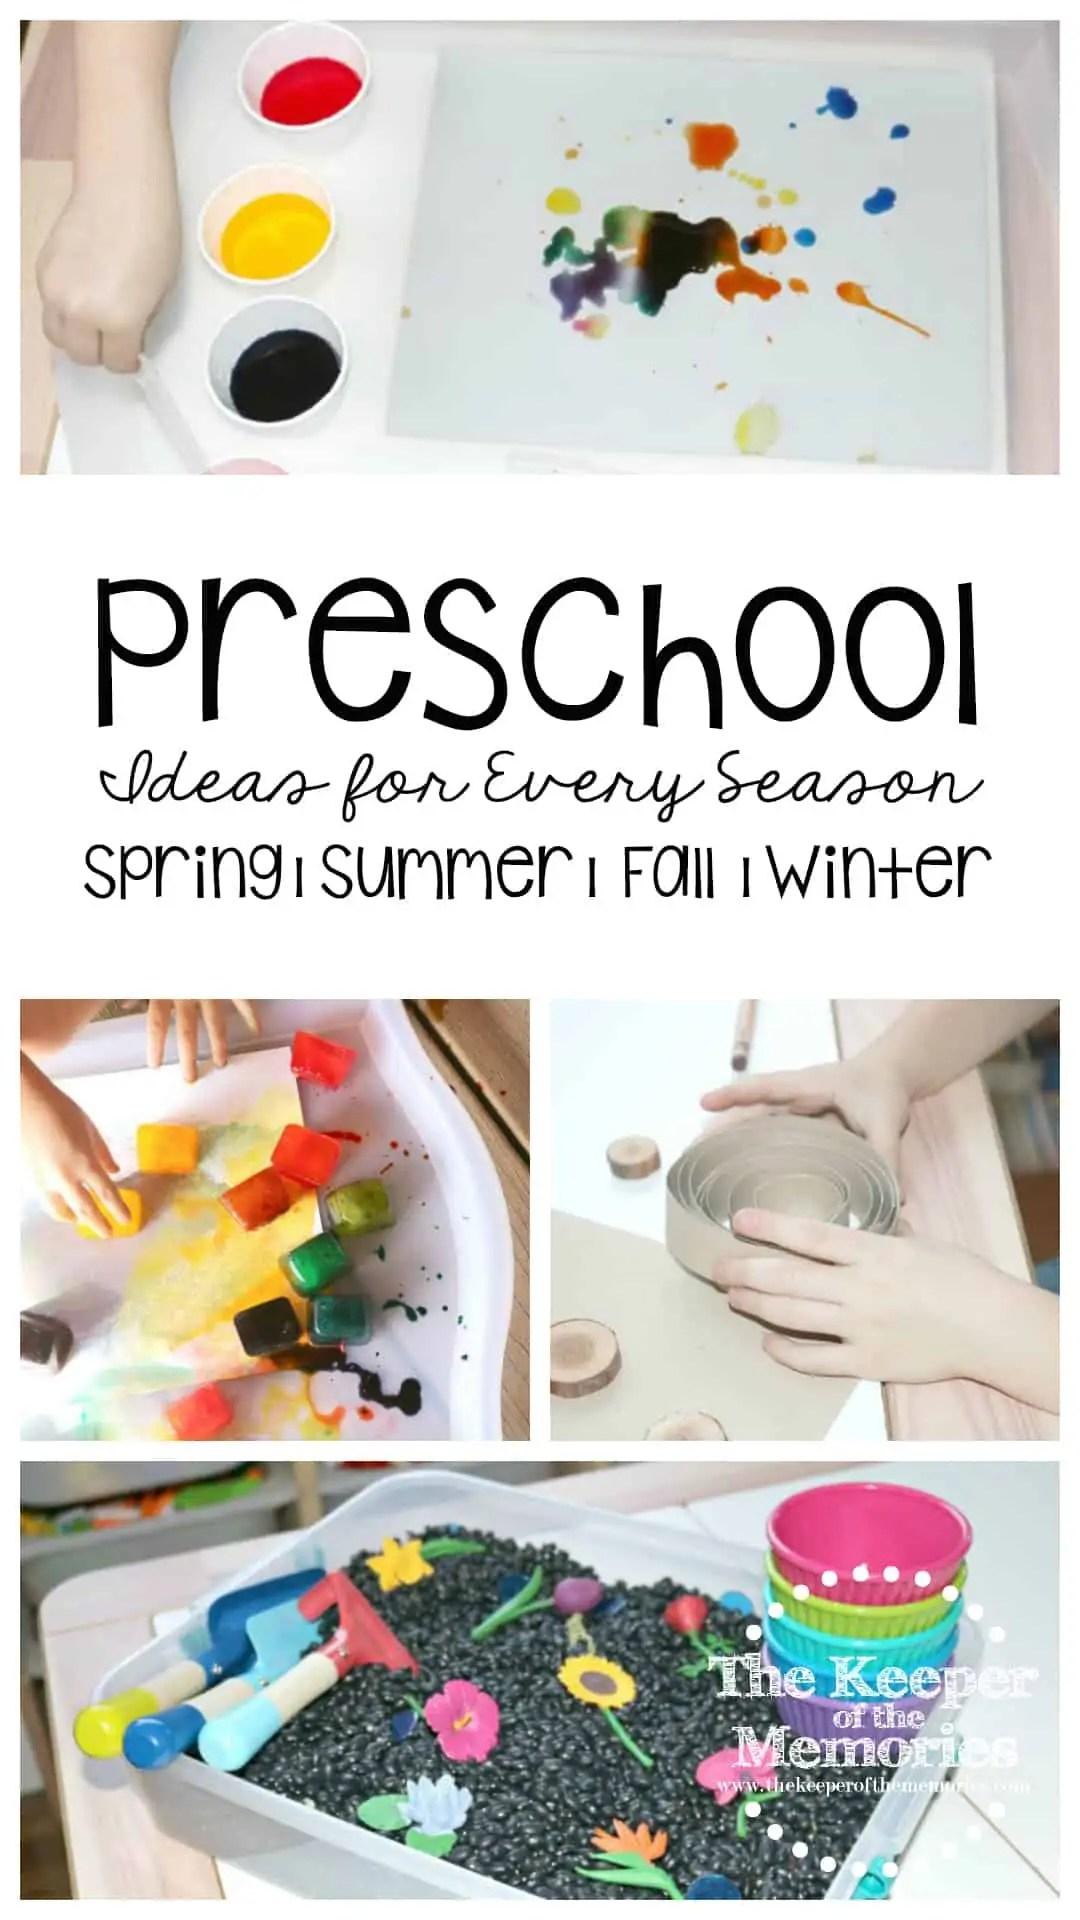 Preschool Ideas For Every Season